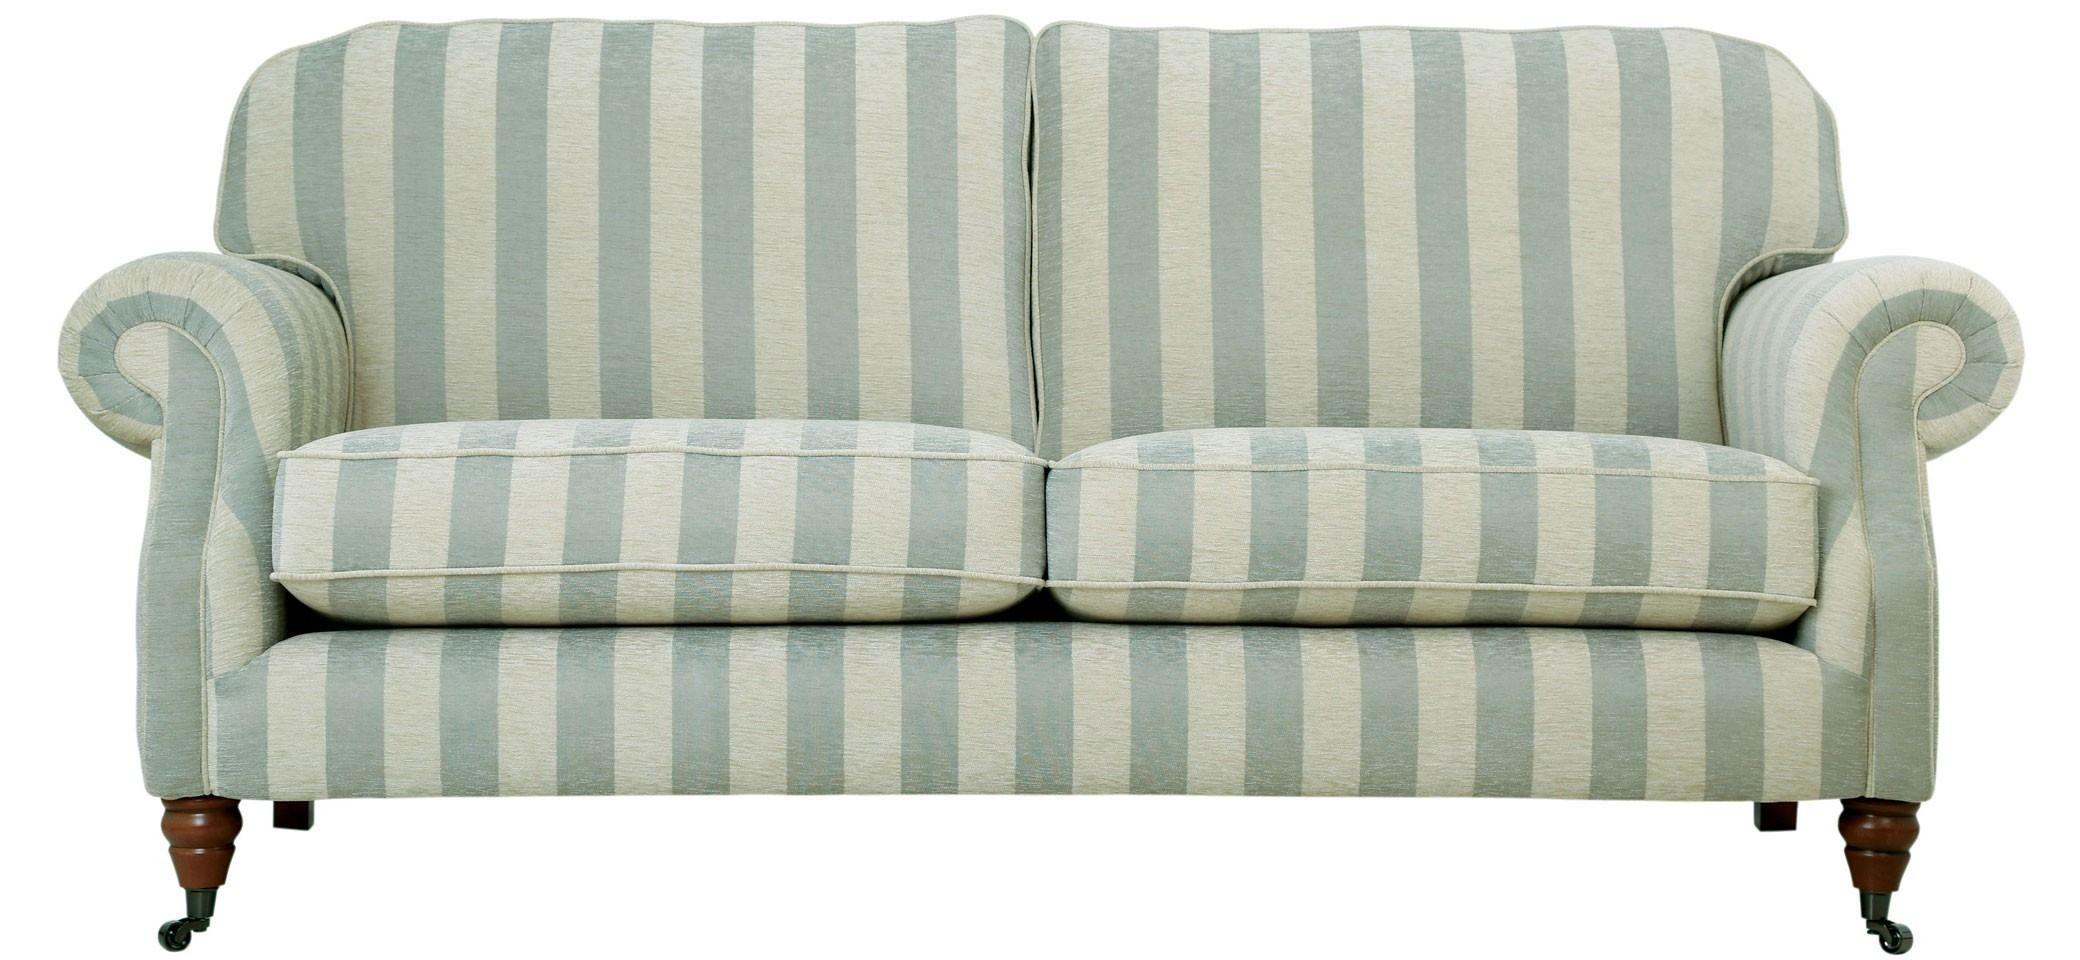 Blenheim 2 Seater Sofa Room ideas Pinterest